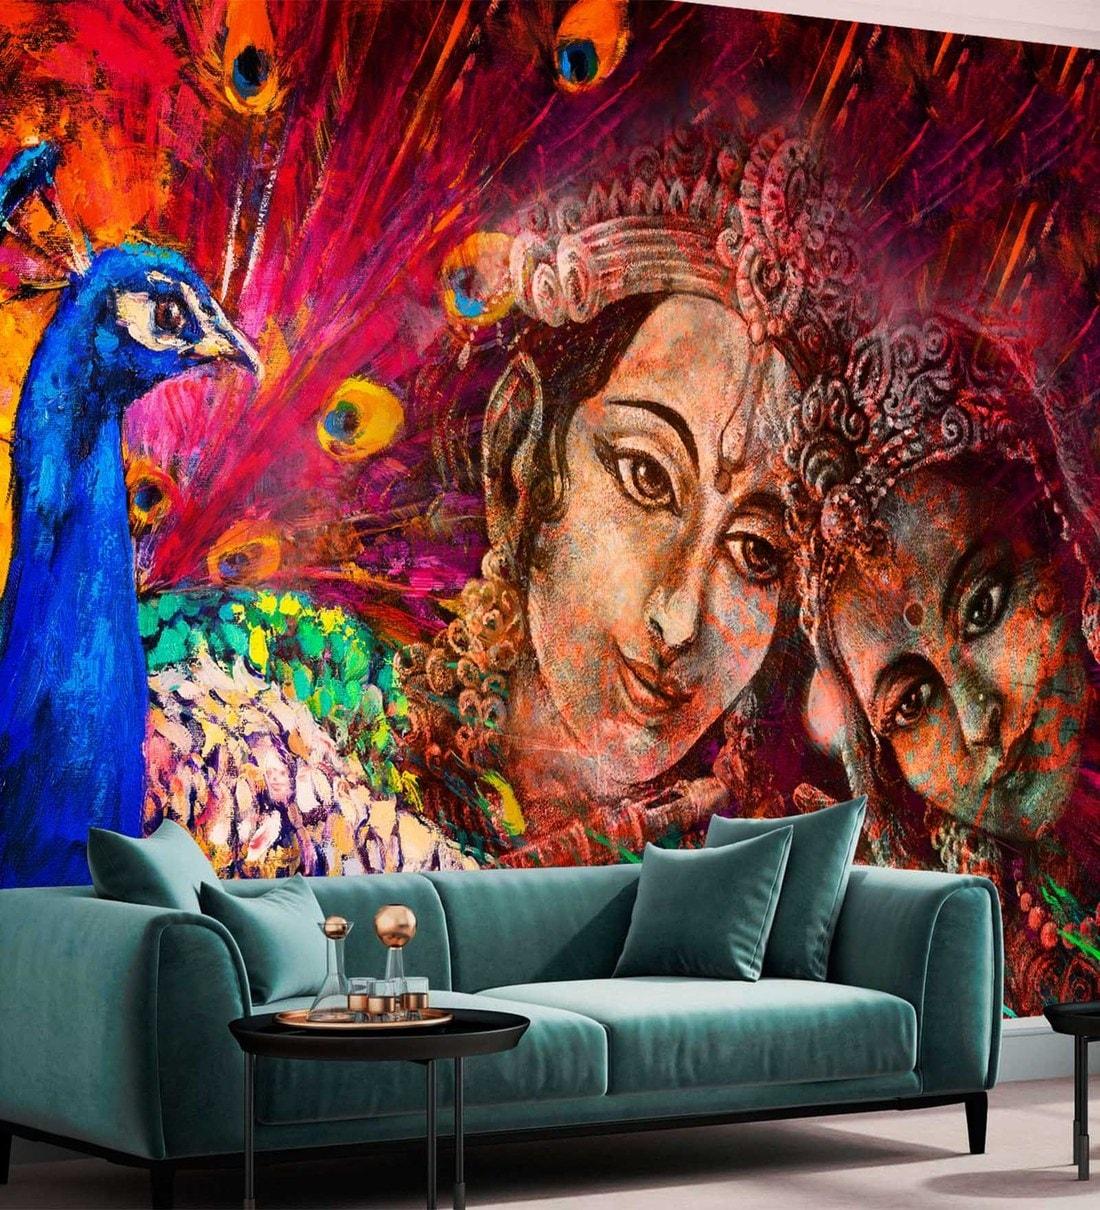 buy multicolour non woven paper 5x9 feet radha krishna wallpaper by zara online spiritual wallpapers furnishings home decor pepperfry product multicolour non woven paper 5x9 feet radha krishna wallpaper